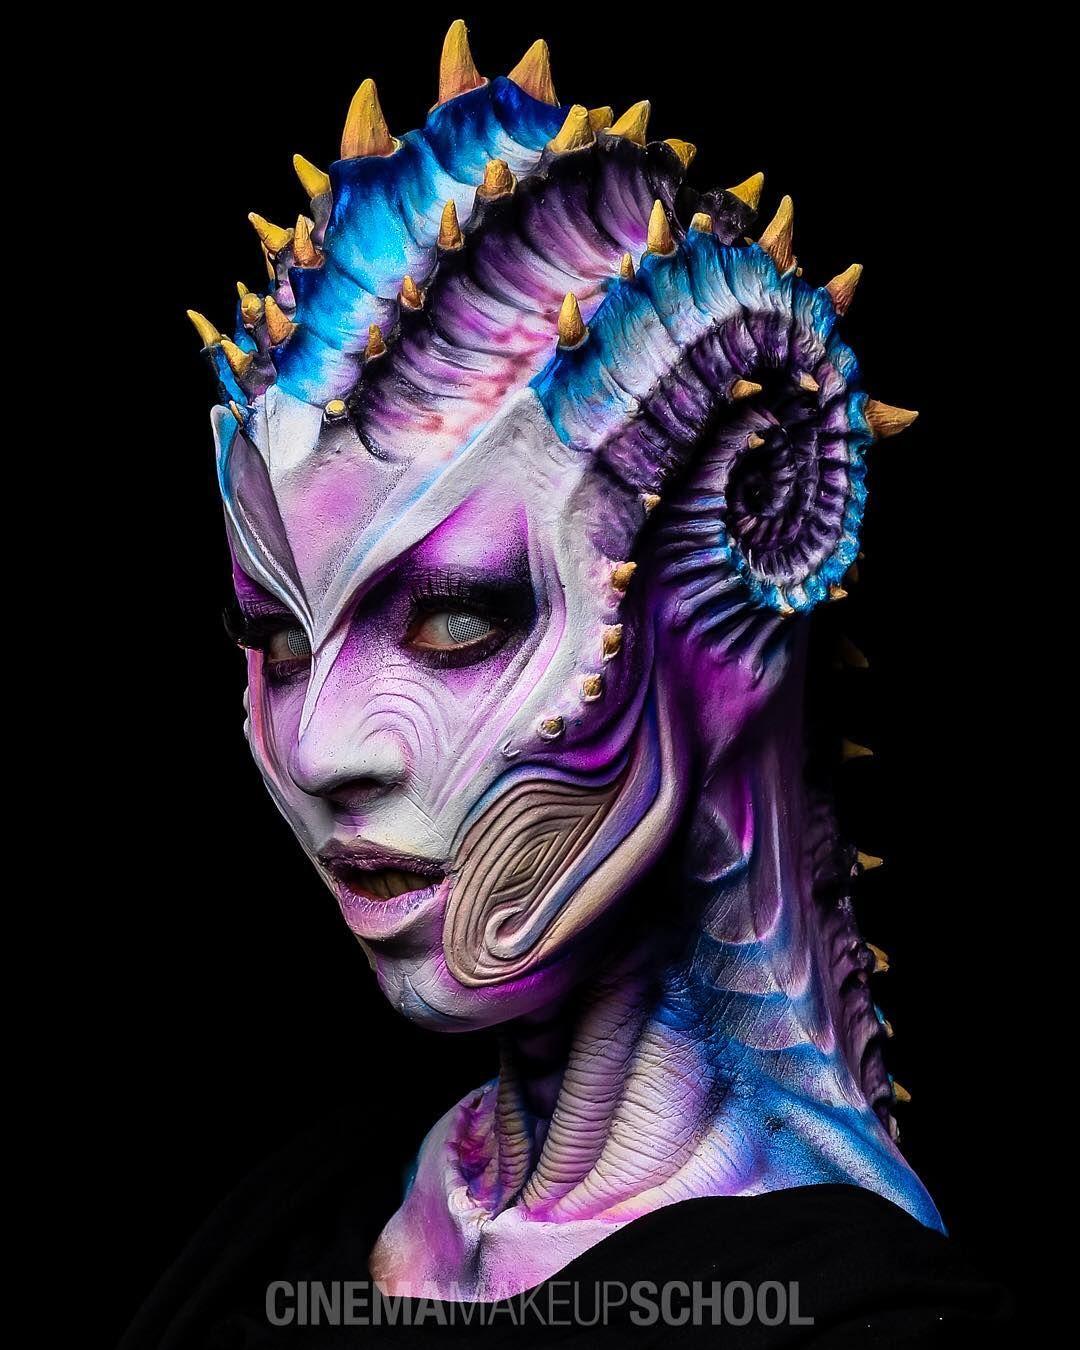 2017 nyxcosmetics 🇪🇦 FaceAwards winner angelaruizmua's